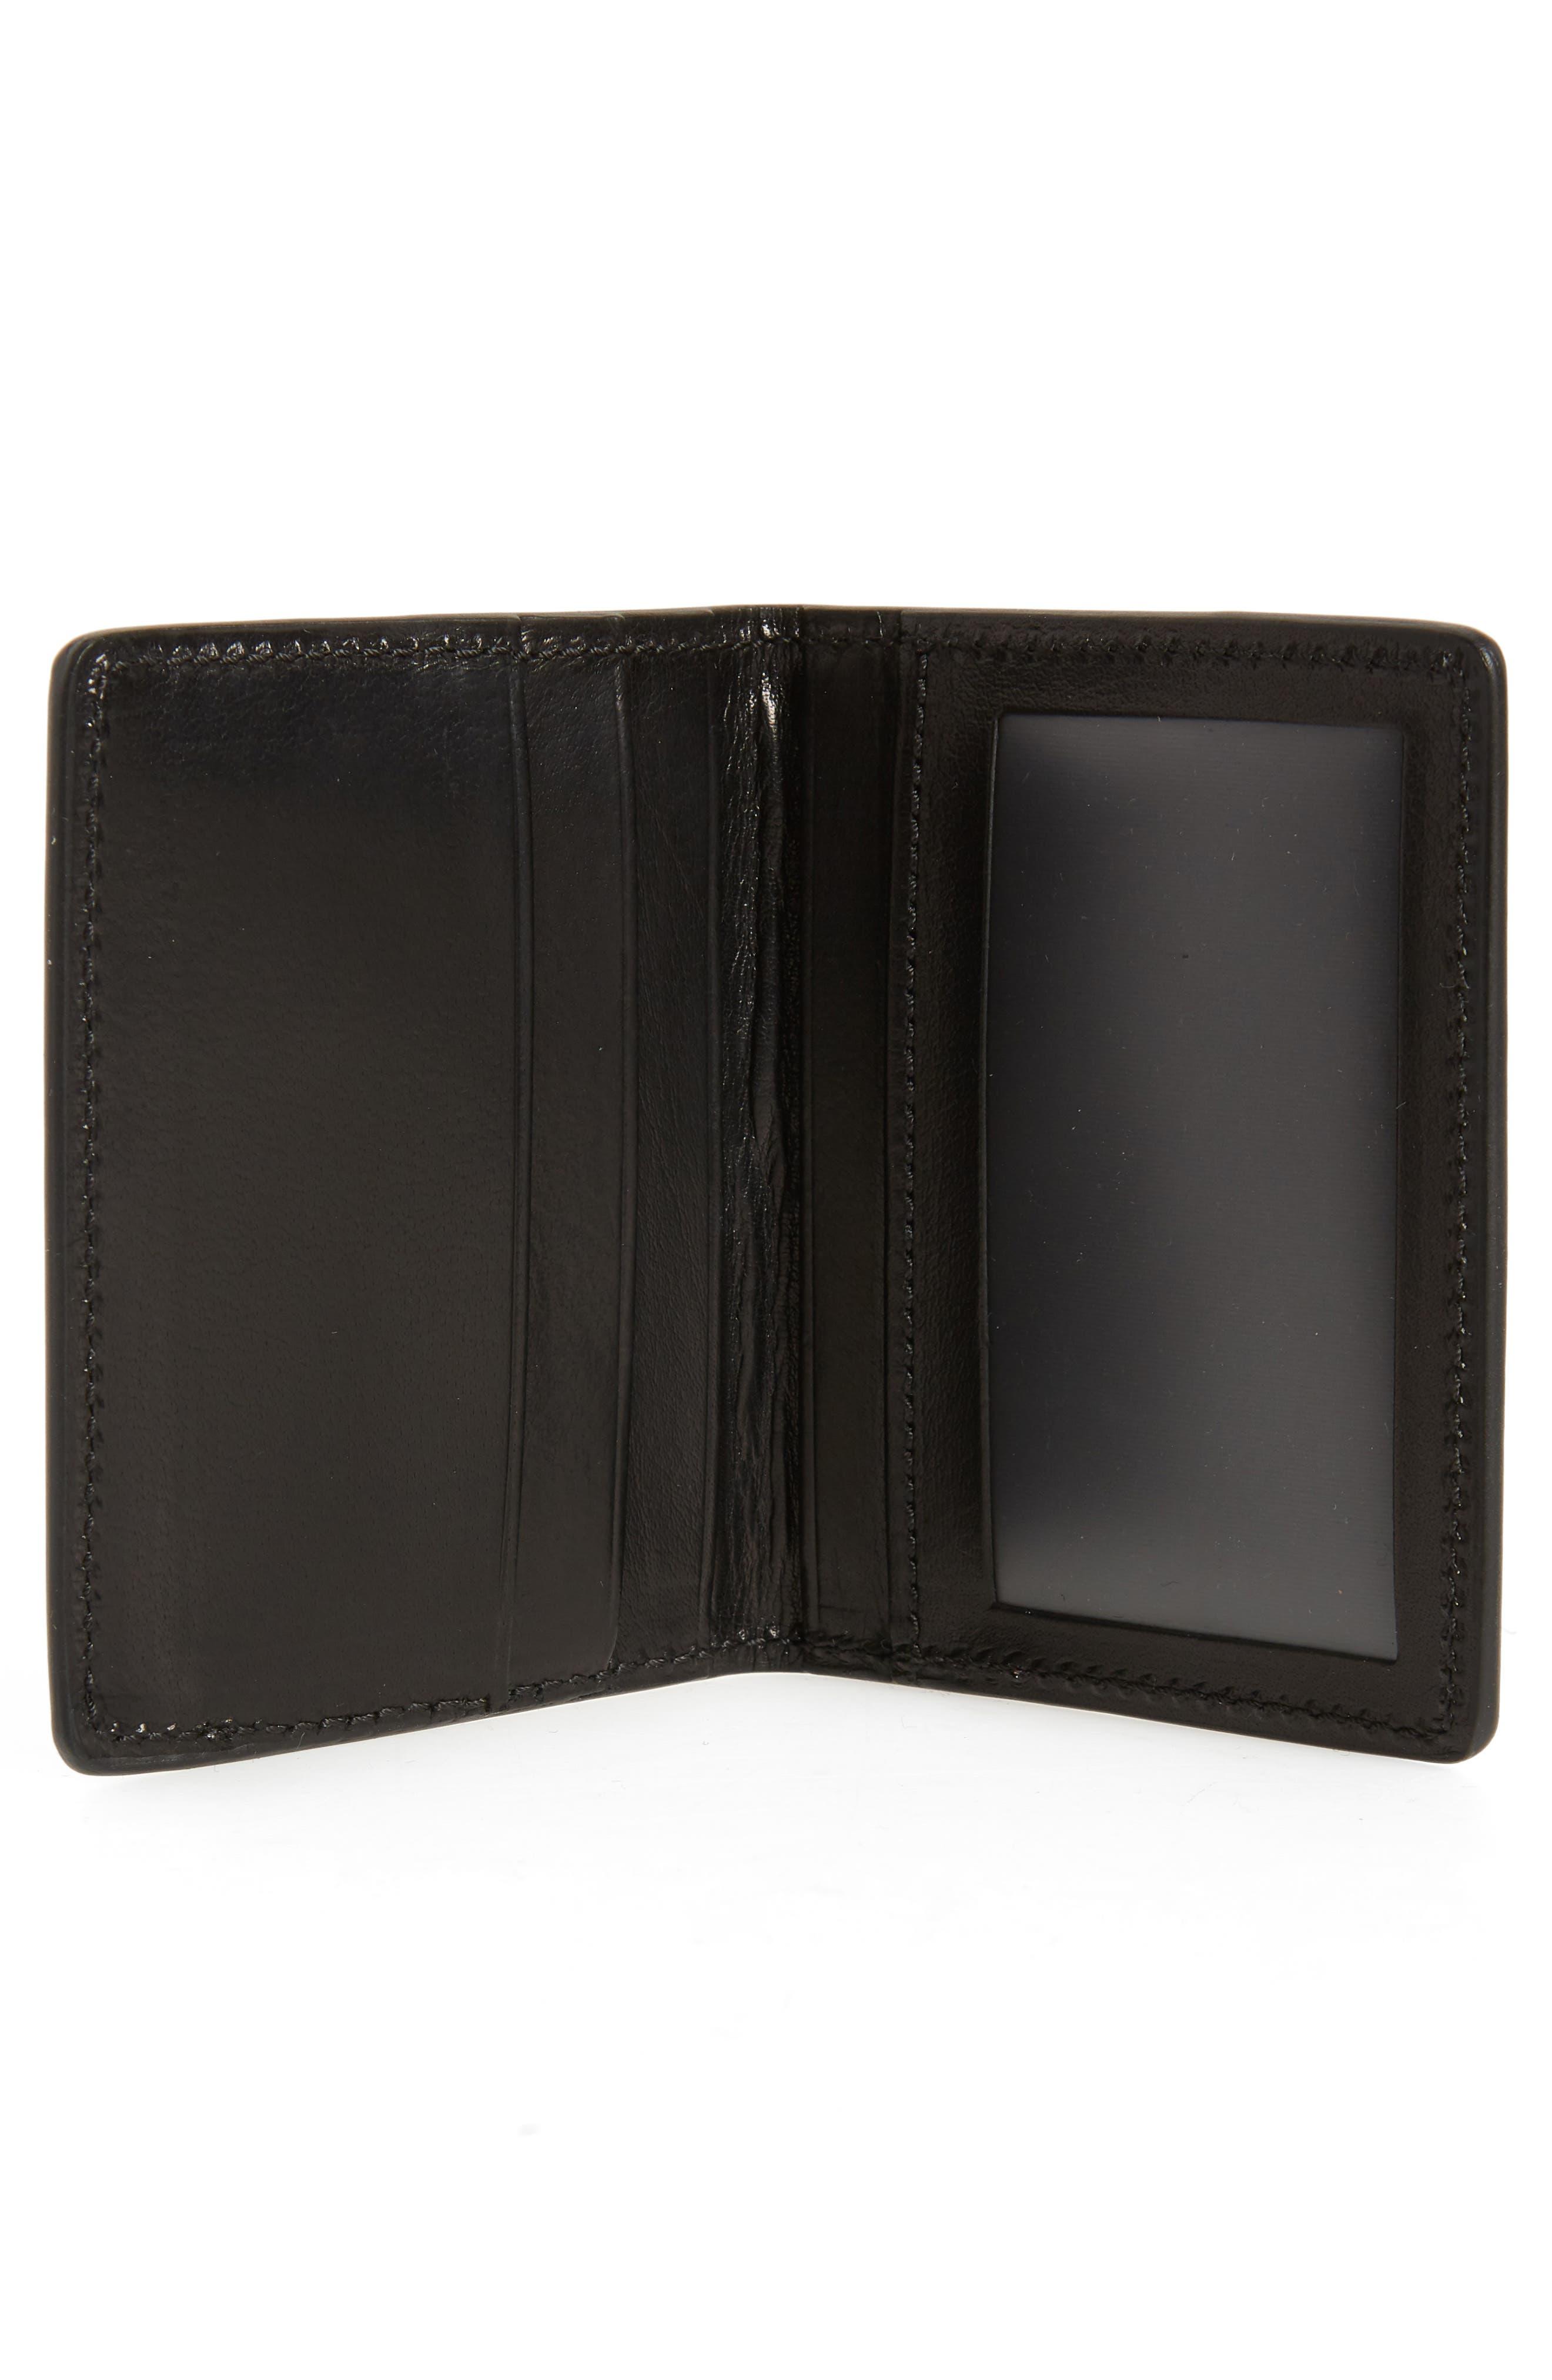 Outlaw Folding Card Case,                             Alternate thumbnail 2, color,                             BLACK